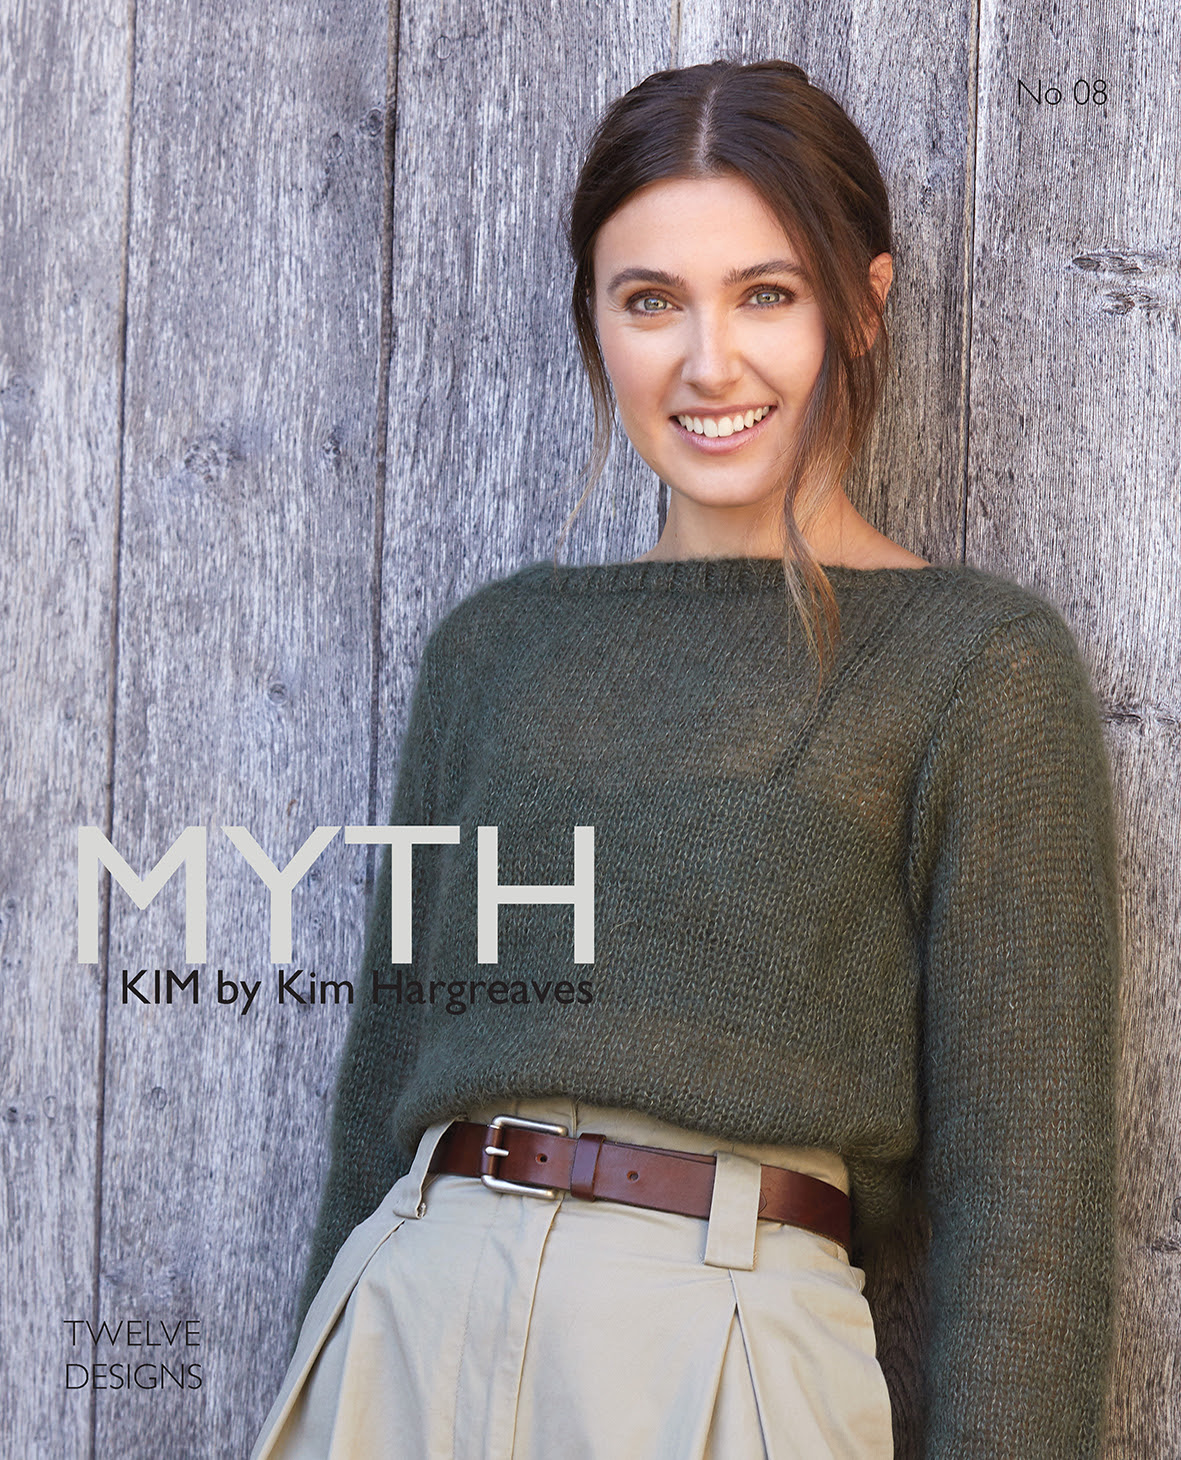 New Kim Hargreaves book MYTH